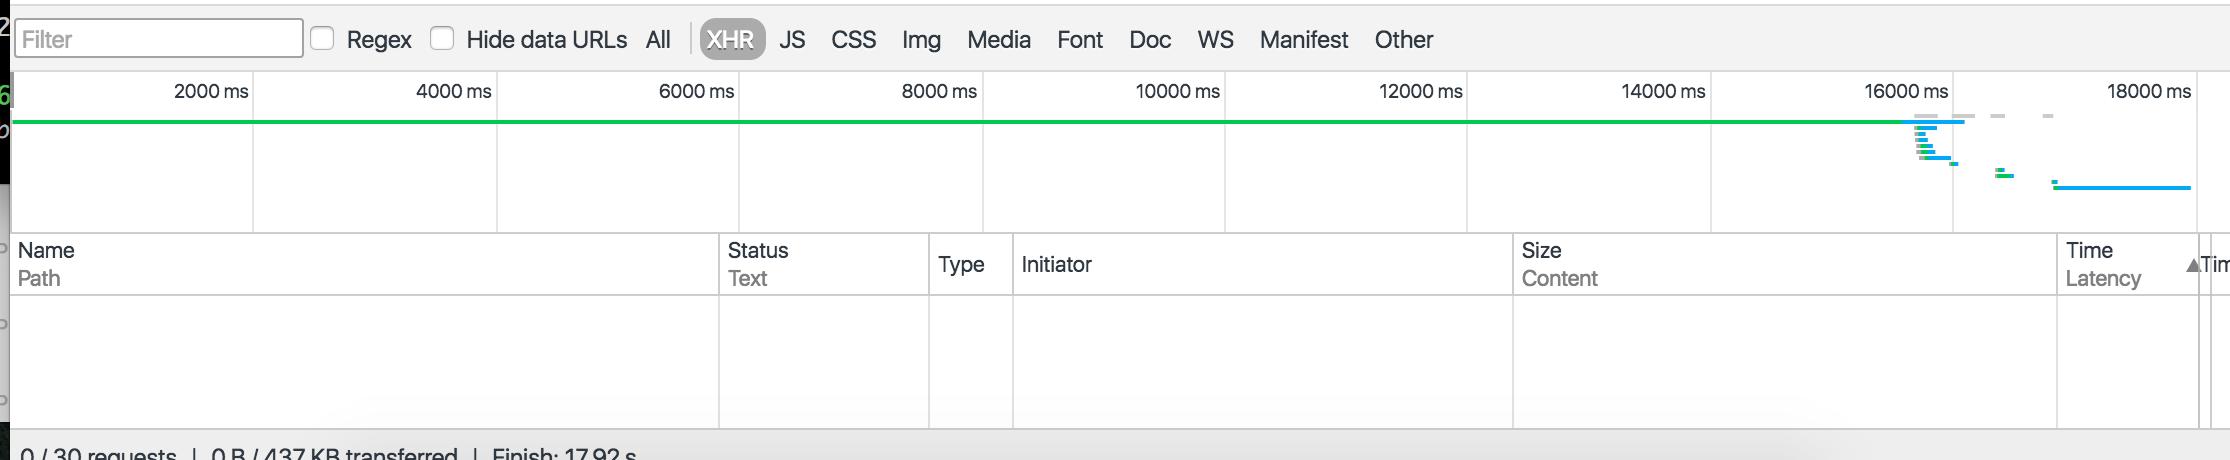 Migrating MongoDB to PostgreSQL · PubPub